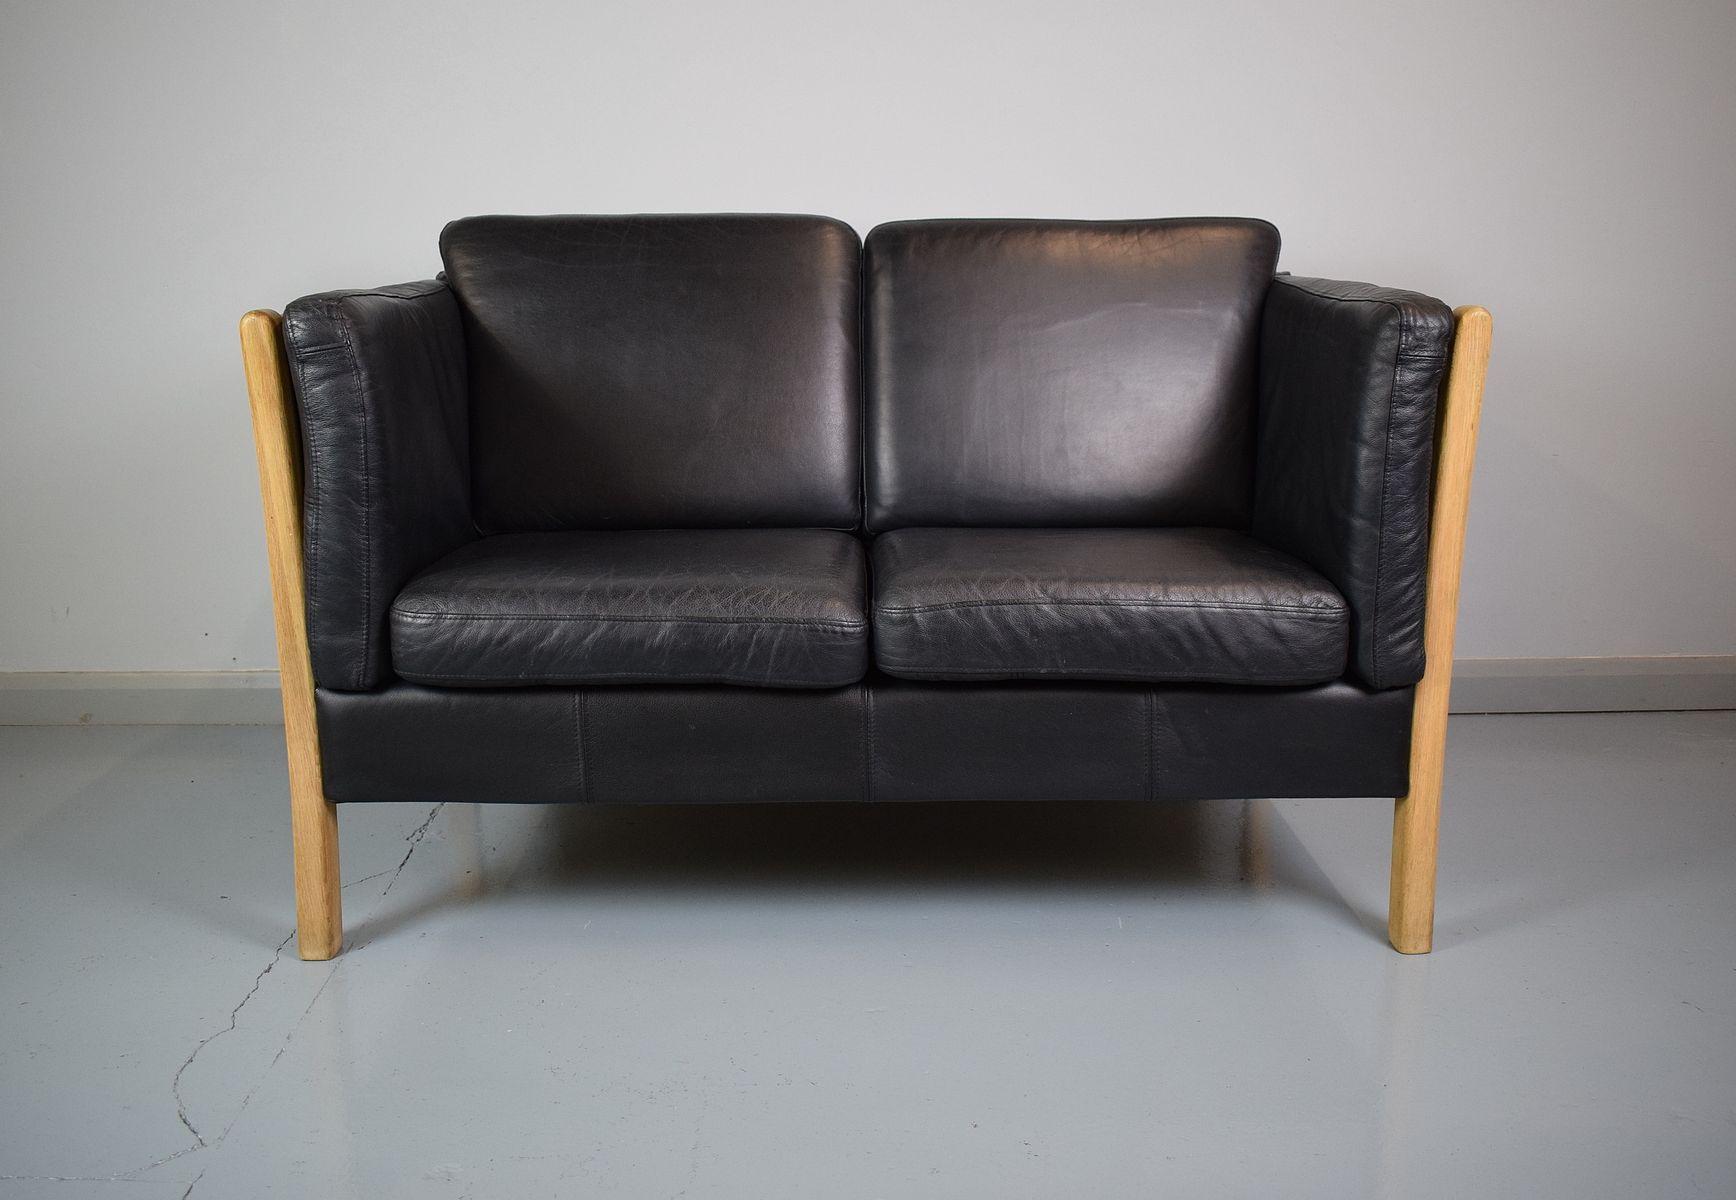 Vintage Danish Black Leather 2-Seater Sofa